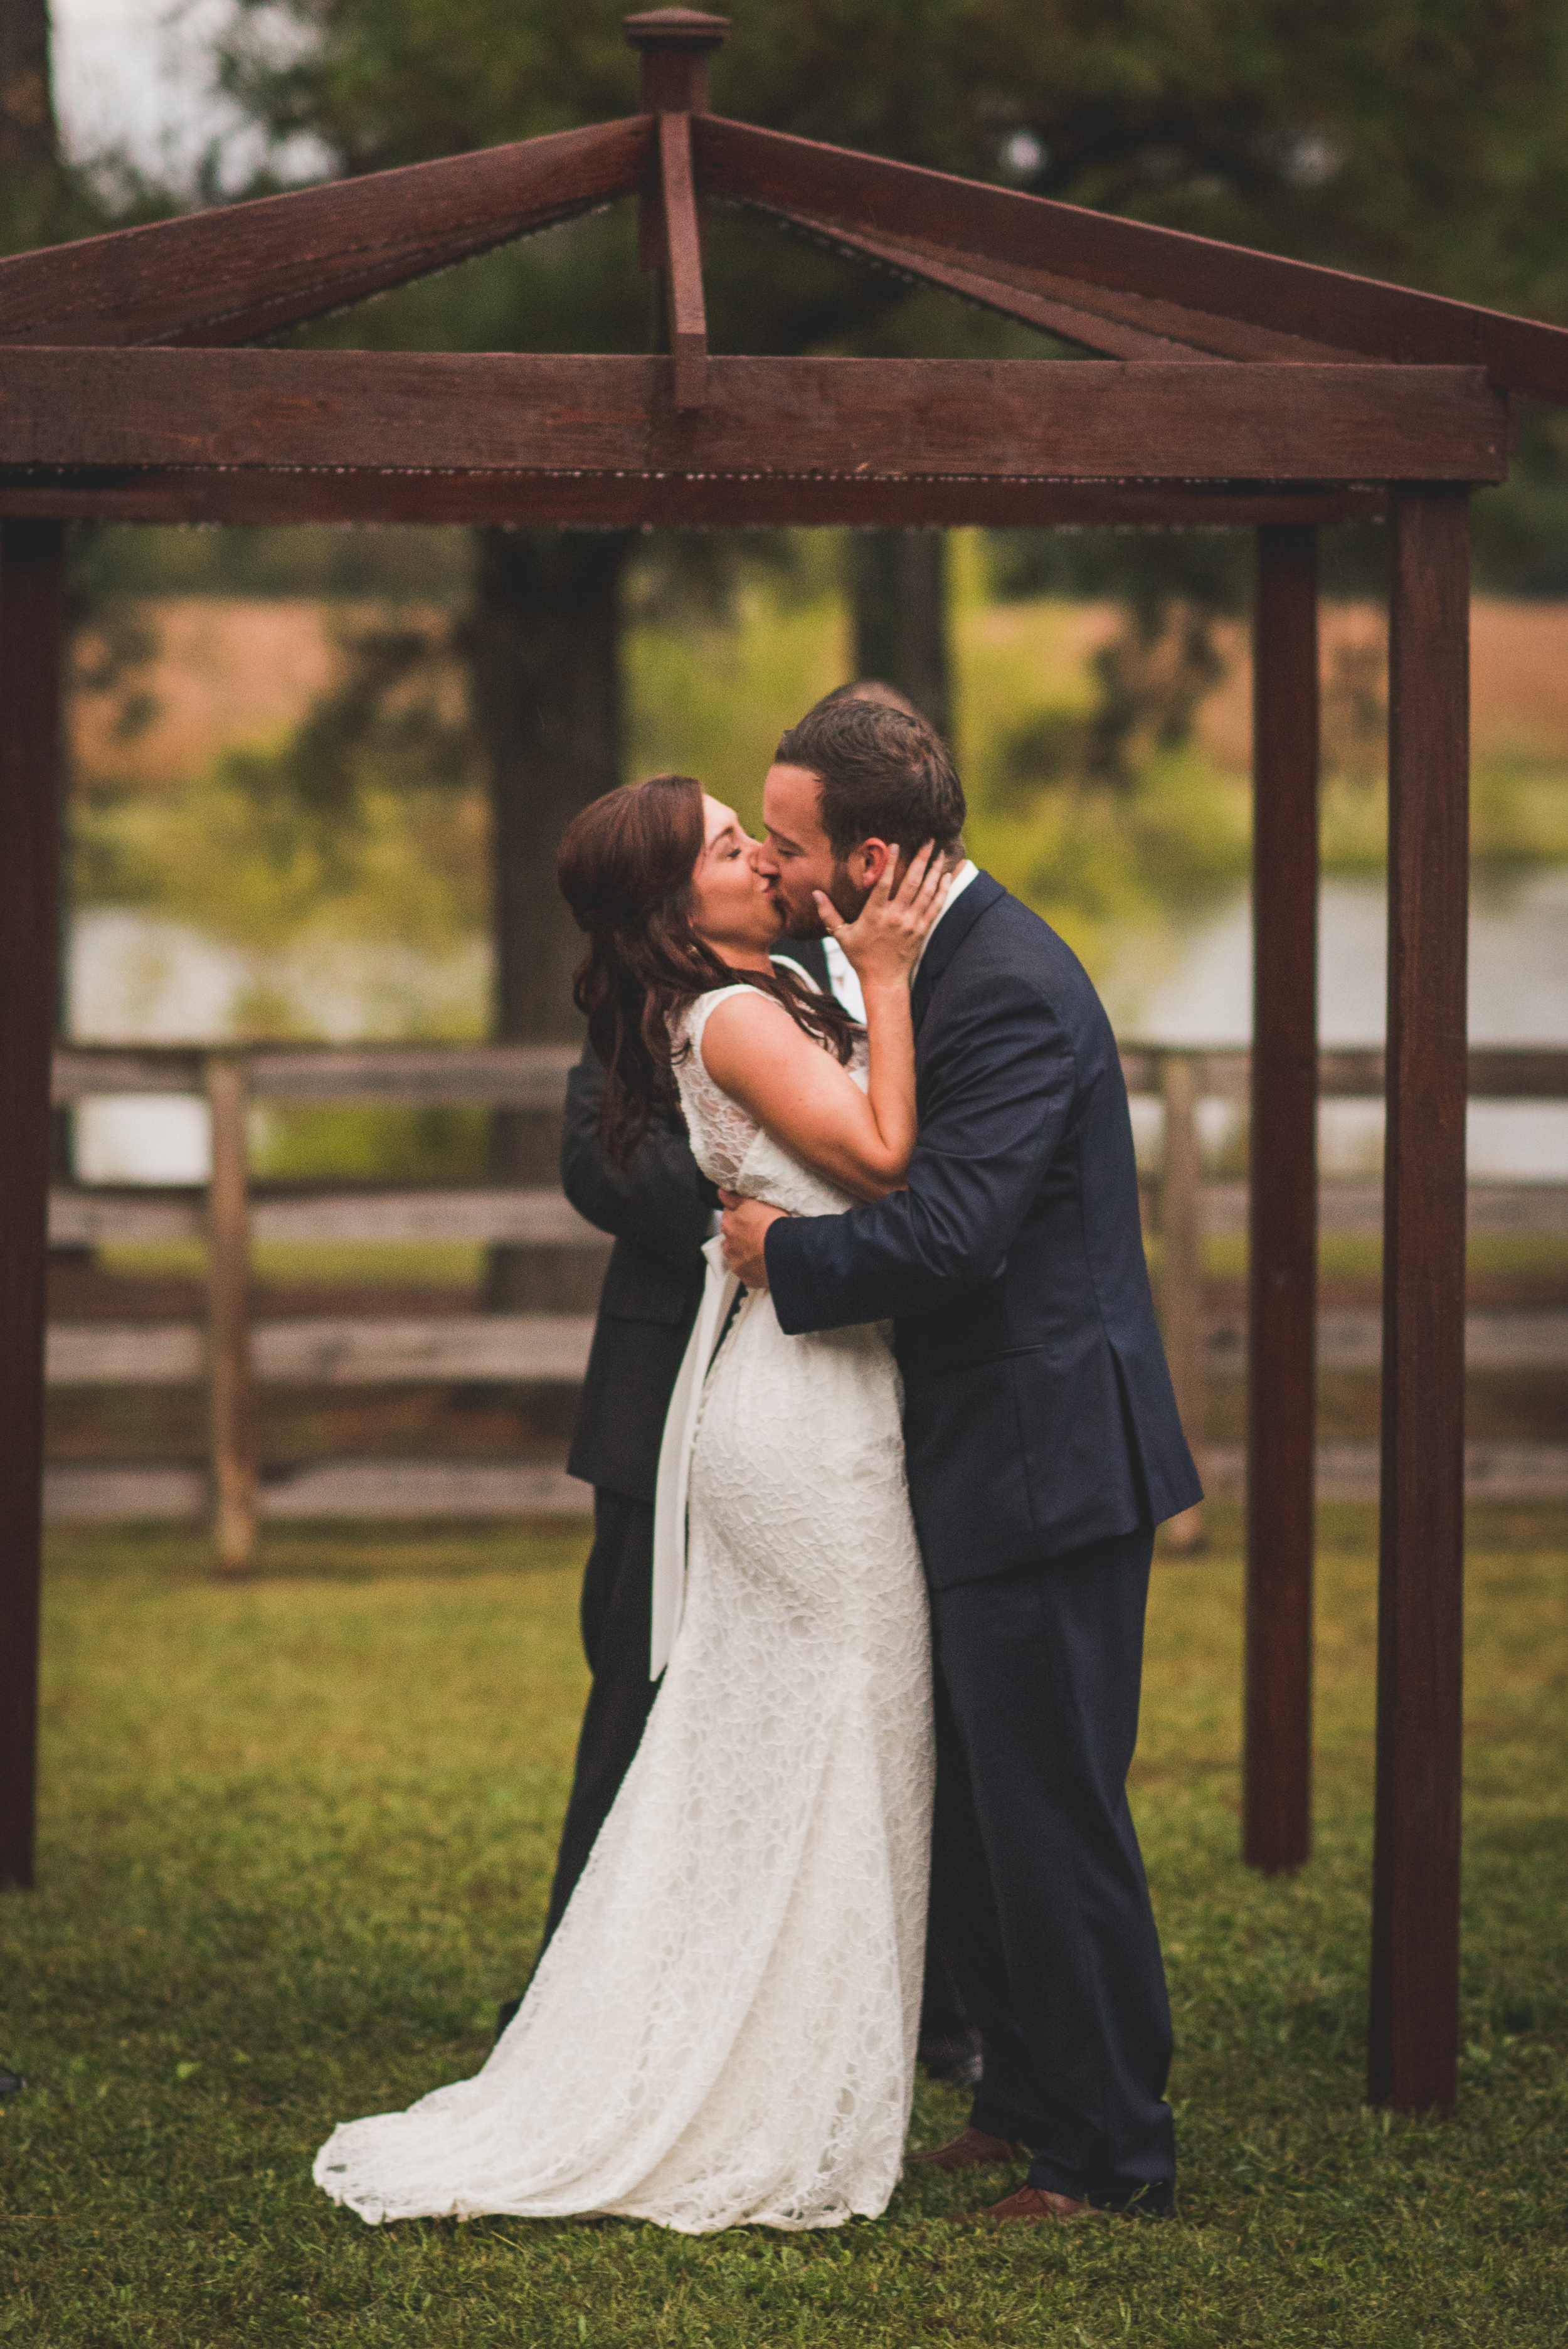 Duck Pond Farm Nashville Wedding Photographer-47.jpg